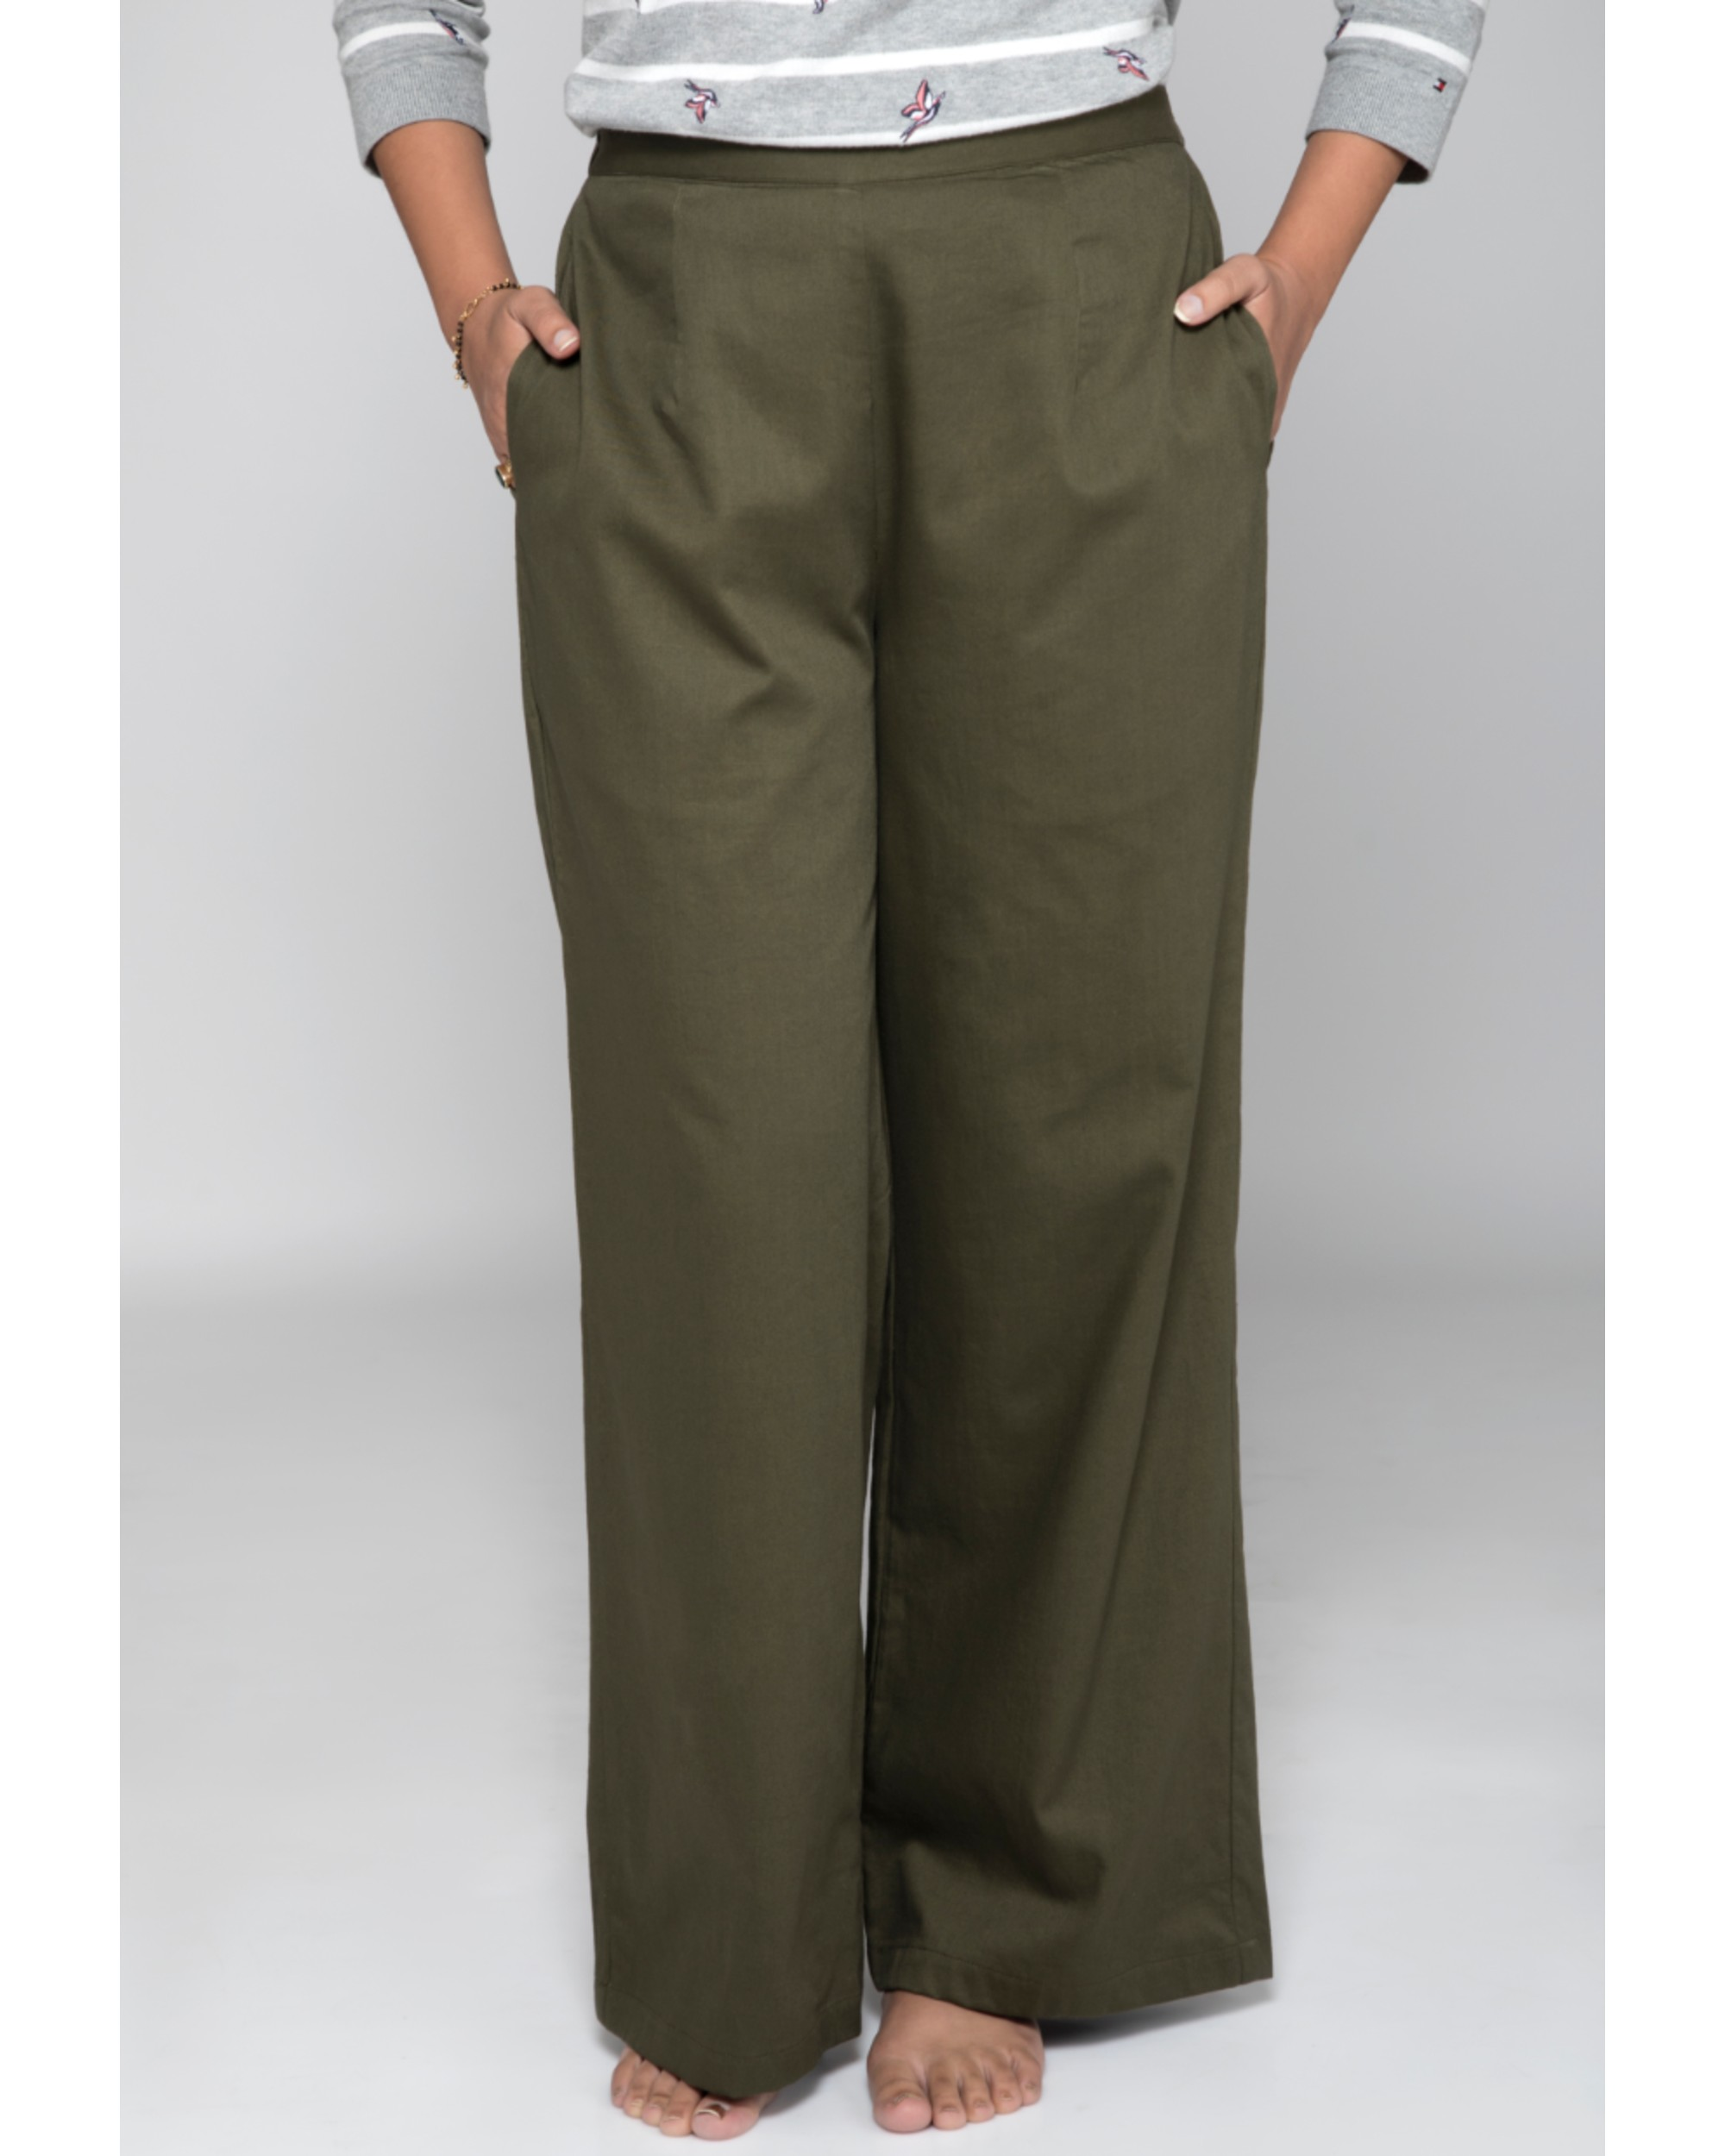 Olive green high waist pants